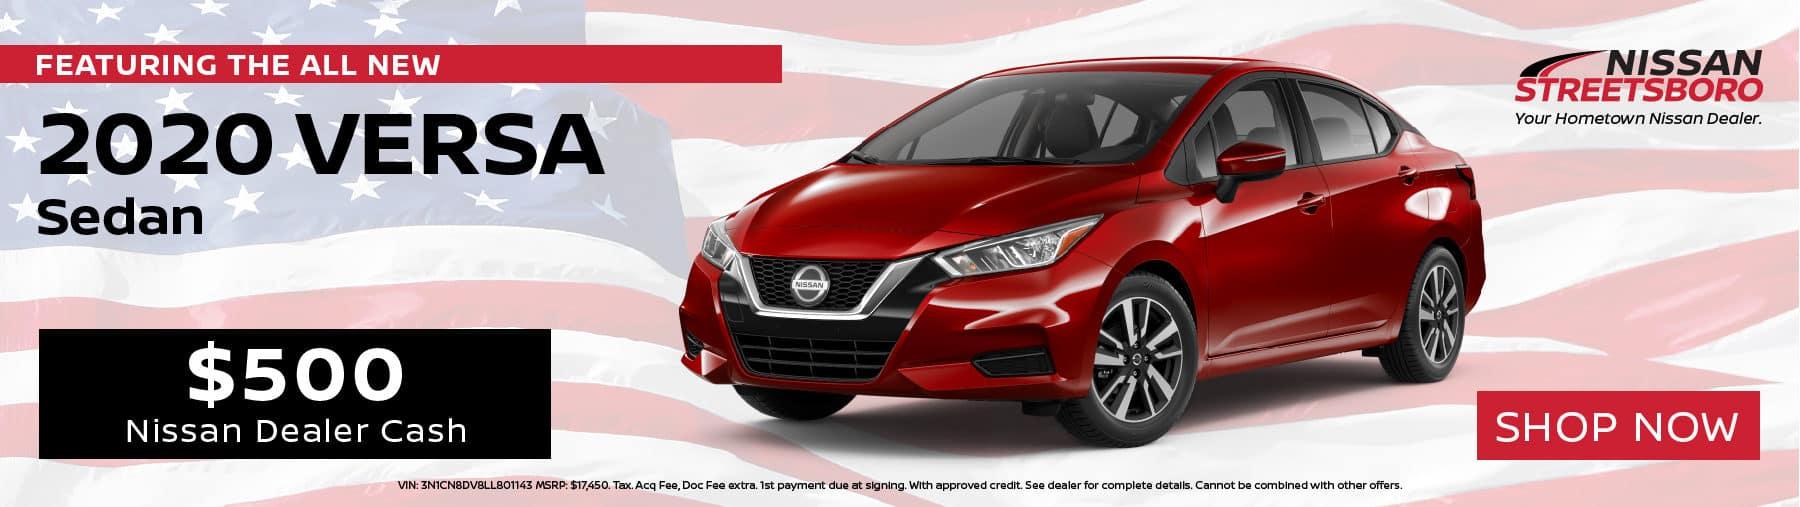 2020 Nissan Versa Incentives